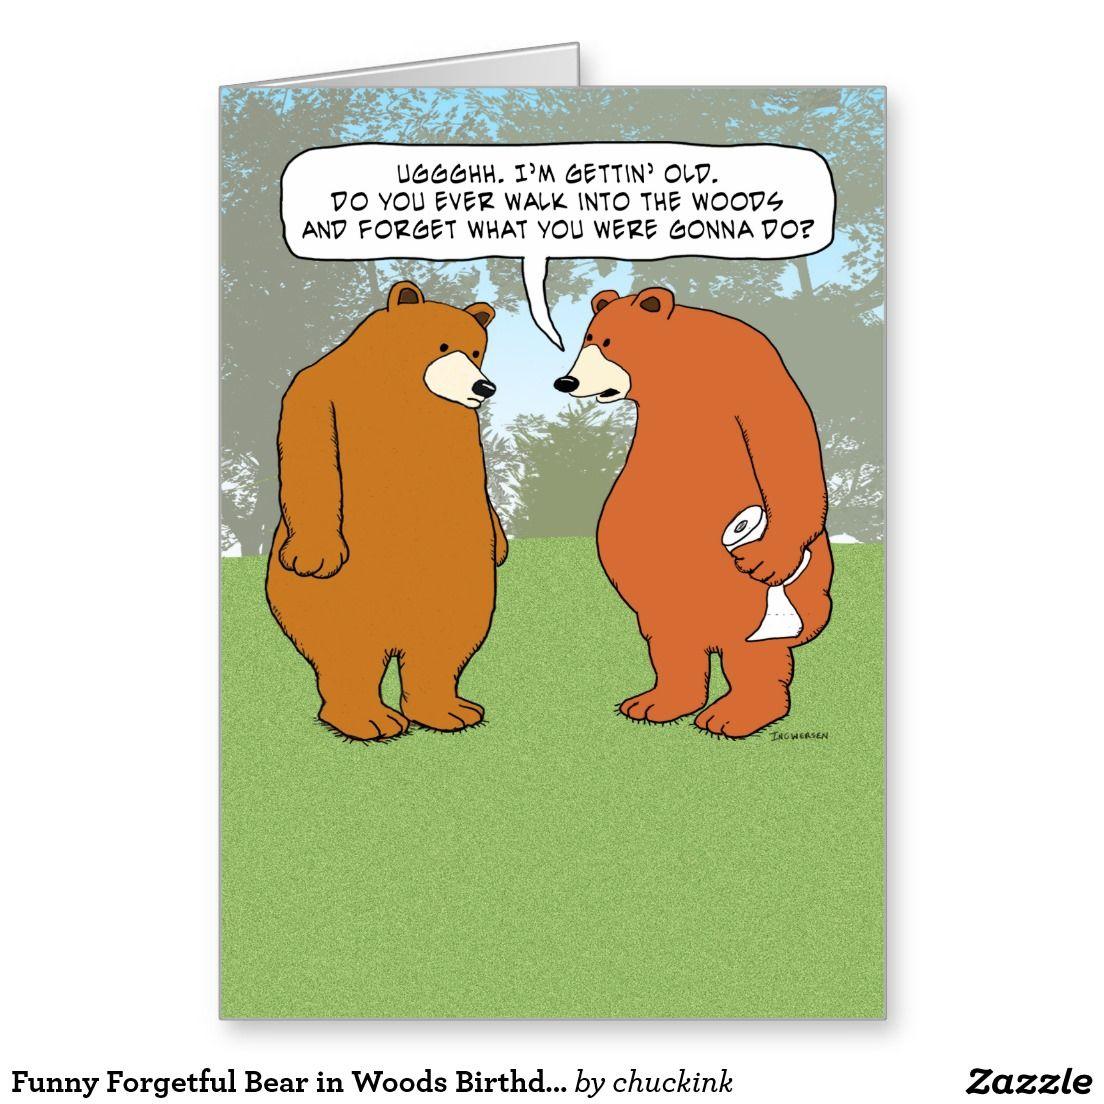 Funny Forgetful Bear In Woods Birthday Card Zazzle Com Funny Birthday Cards Funny Cards Funny